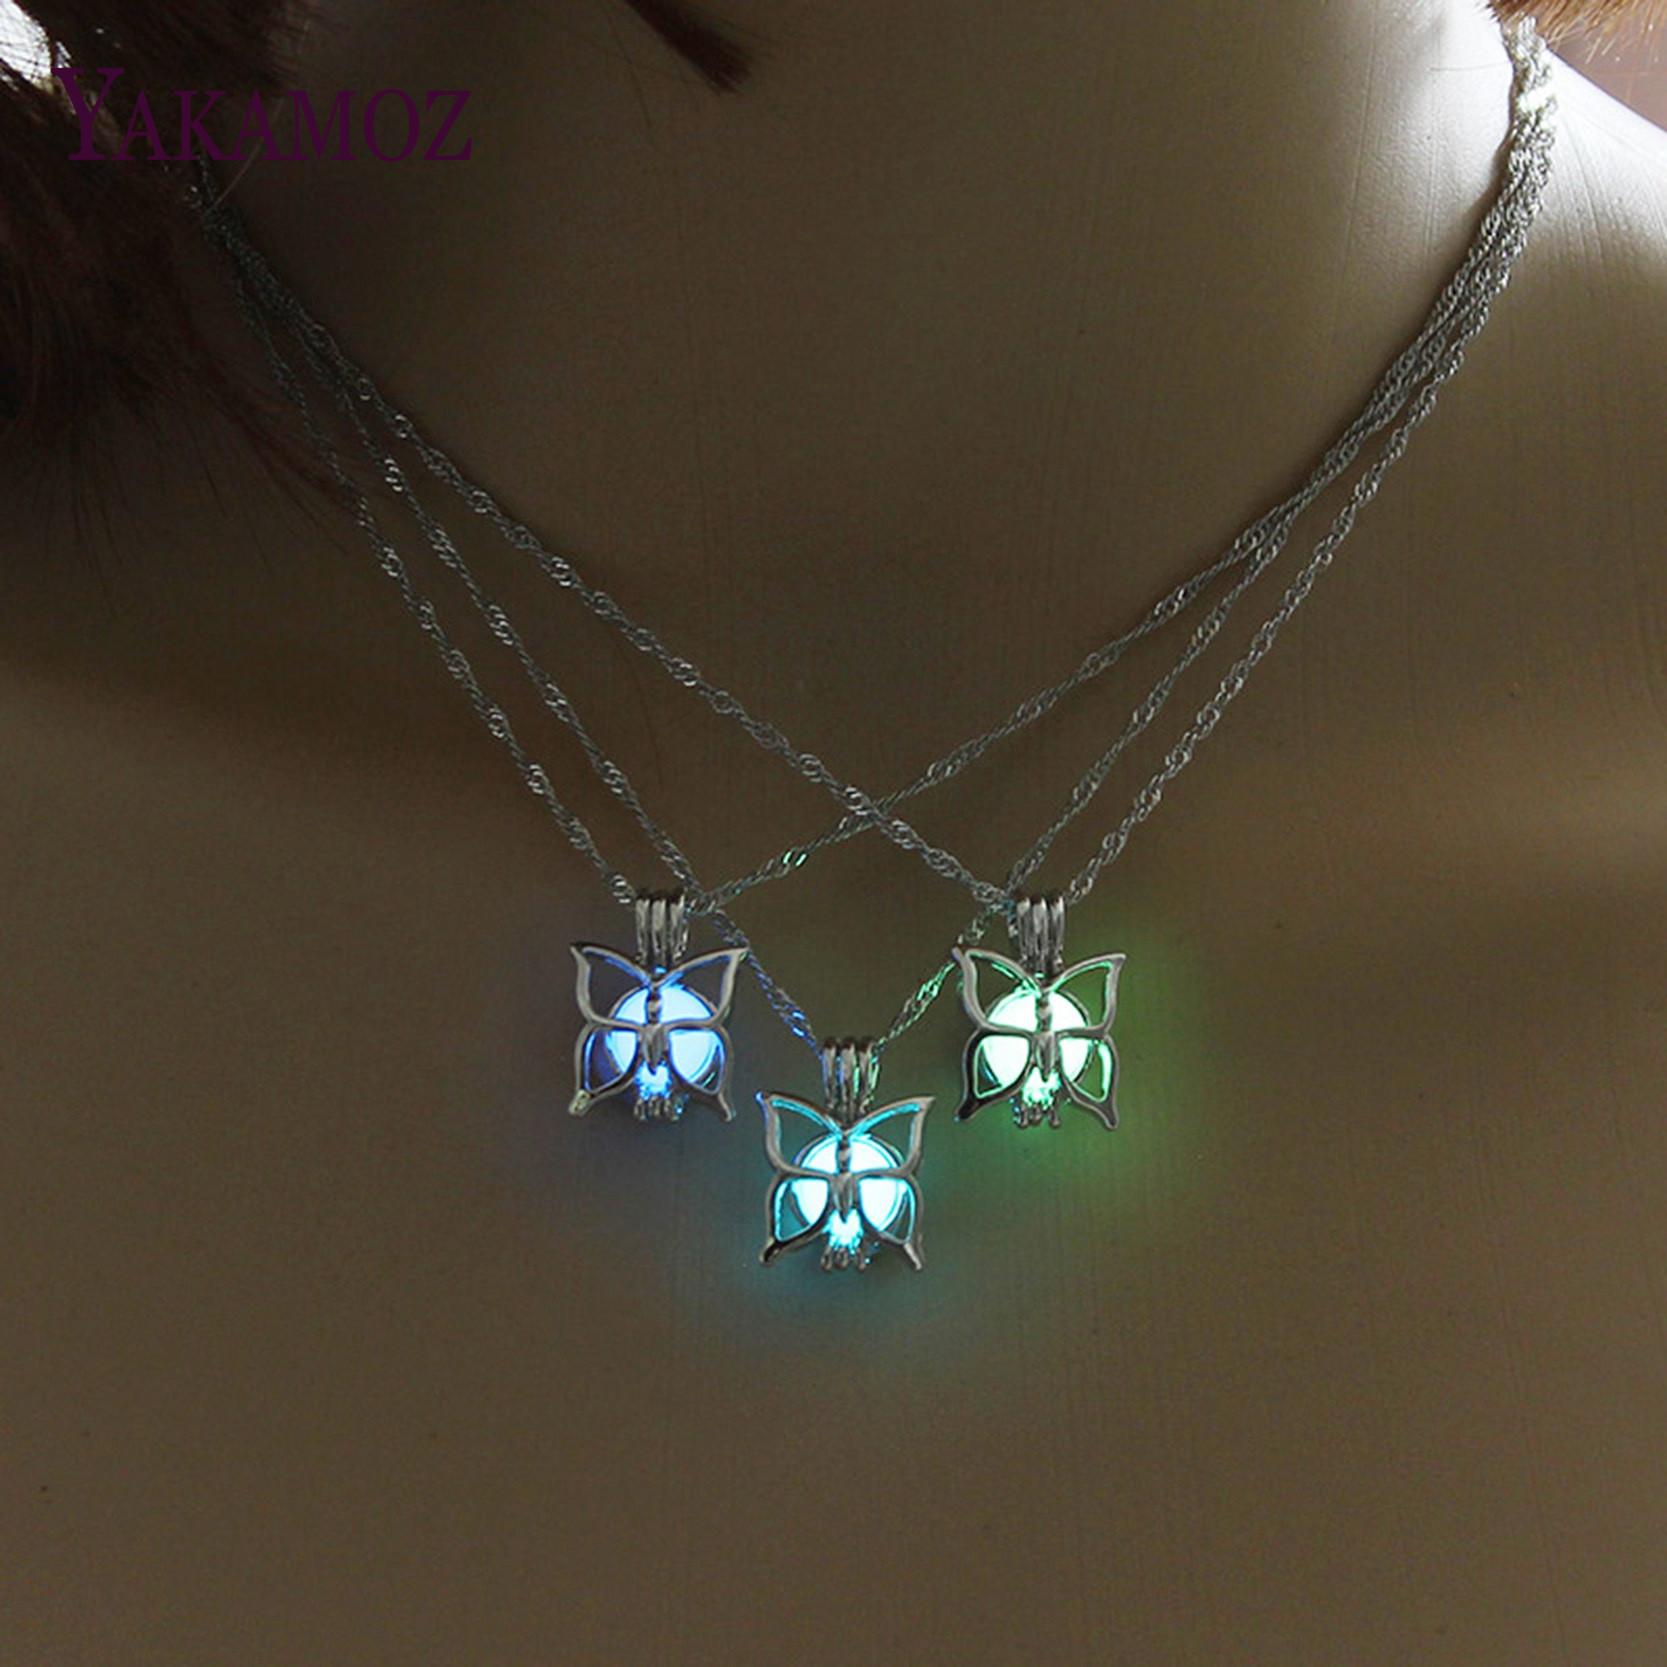 VINTAGE GLOW in the Dark Moon Coeur Charme Collier Pendentif Lumineux Bijoux Cadeau